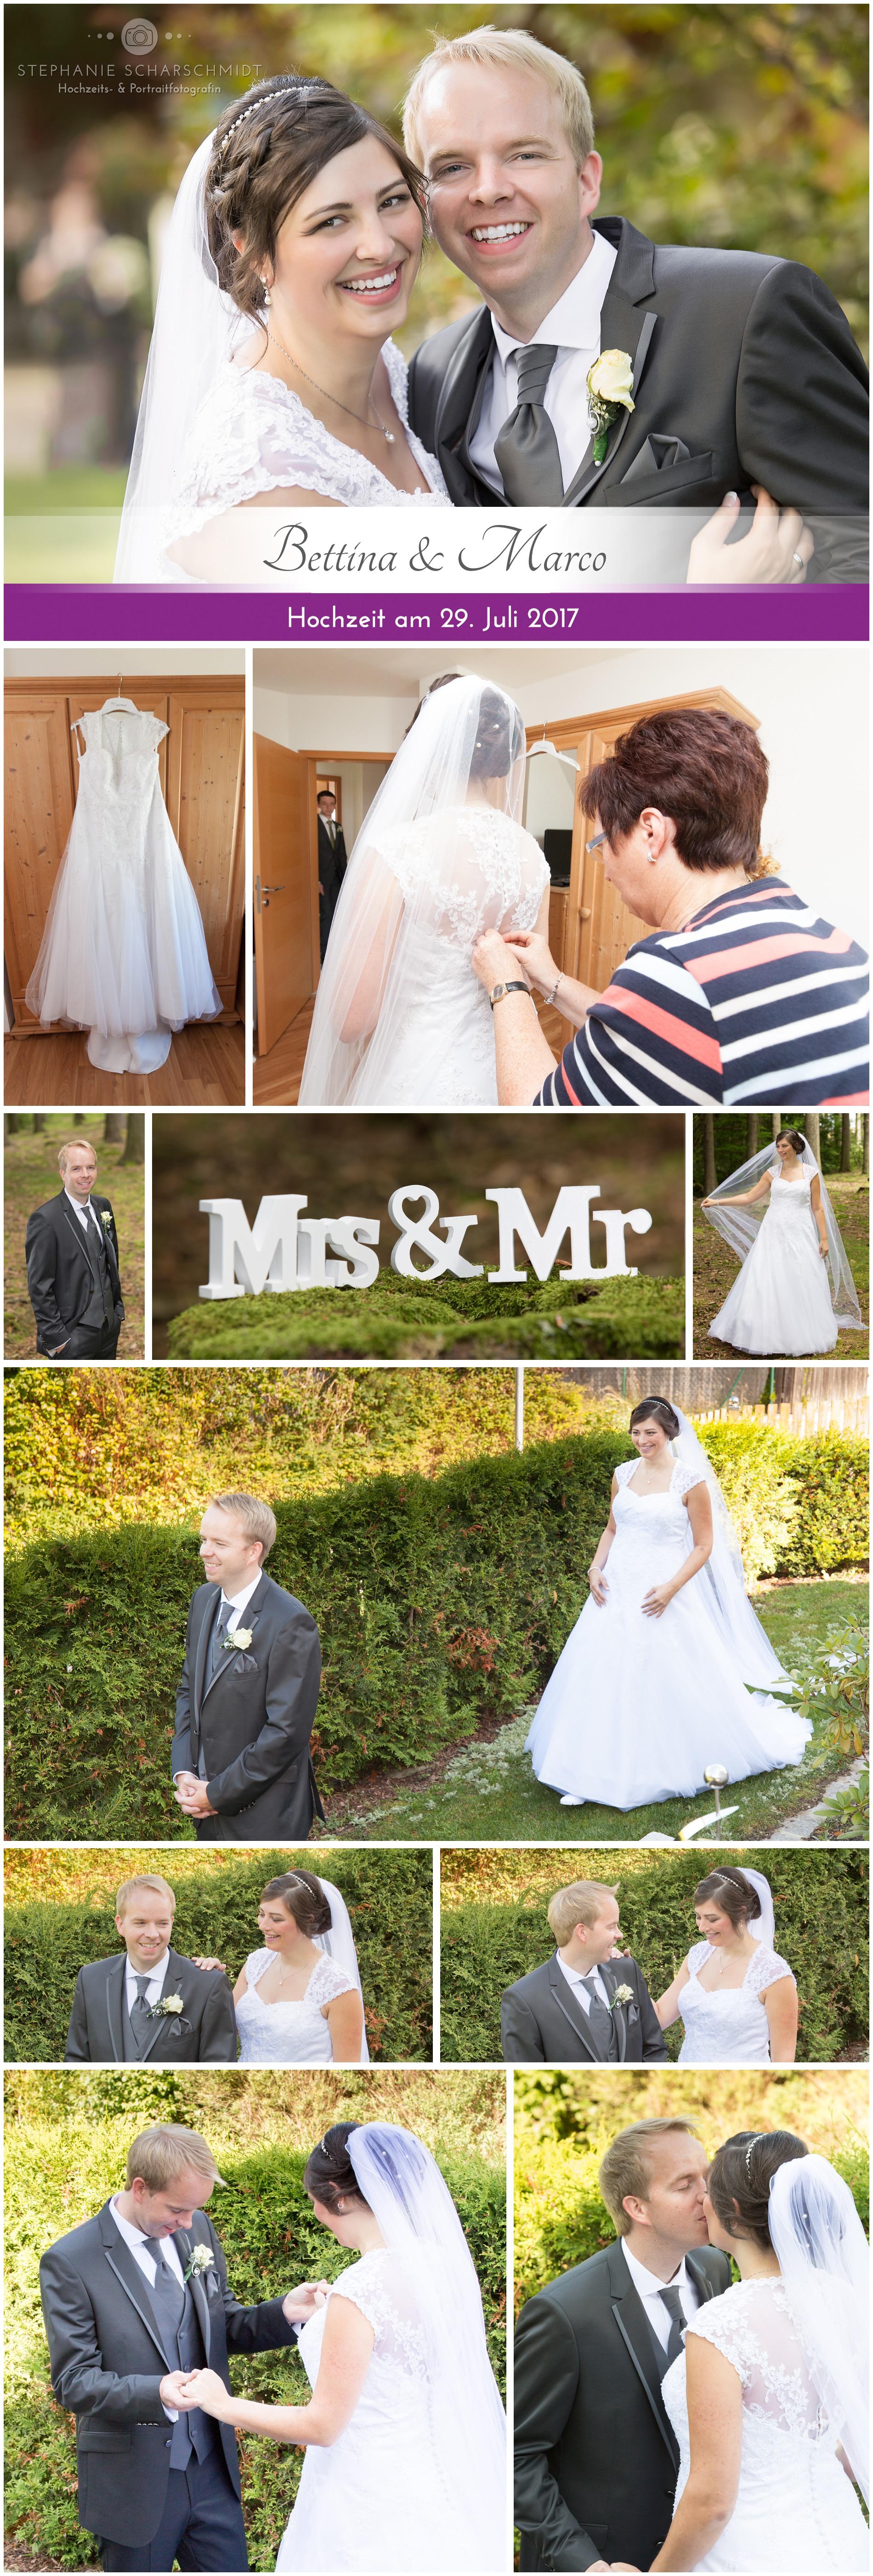 Hochzeitsfotograf Hof - Fotograf Stephanie Scharschmidt